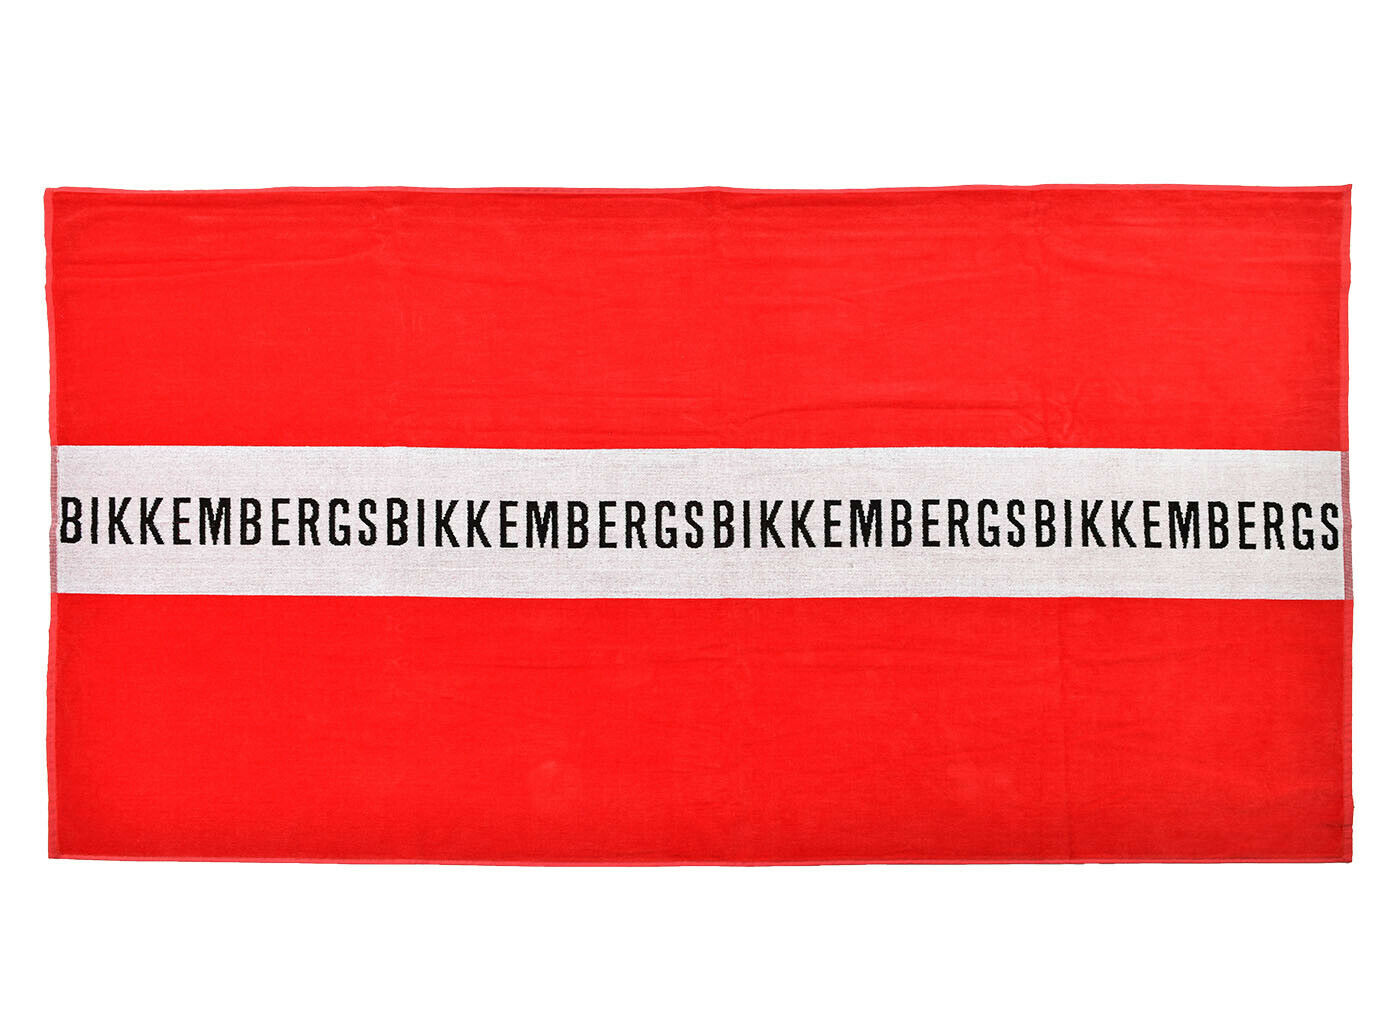 BIKKEMBERGS Unisex Beach Towel Bath Logo Approx. 39 3/8x66 7/8in Selection Of